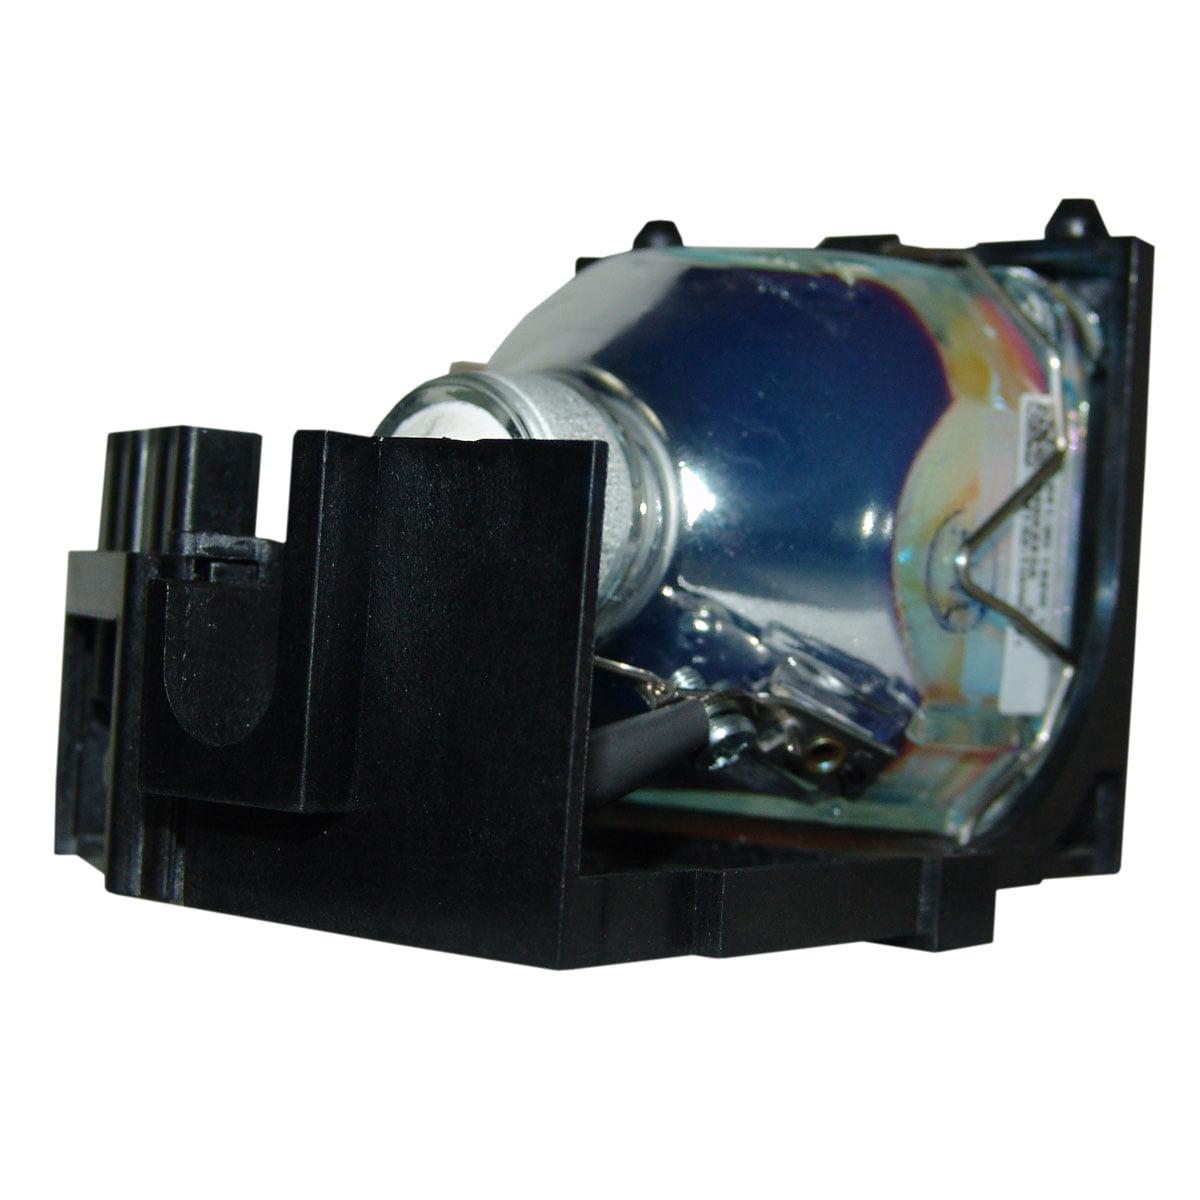 Lutema Platinum for Liesegang DV-345 Projector Lamp (Original Philips Bulb) - image 3 de 5